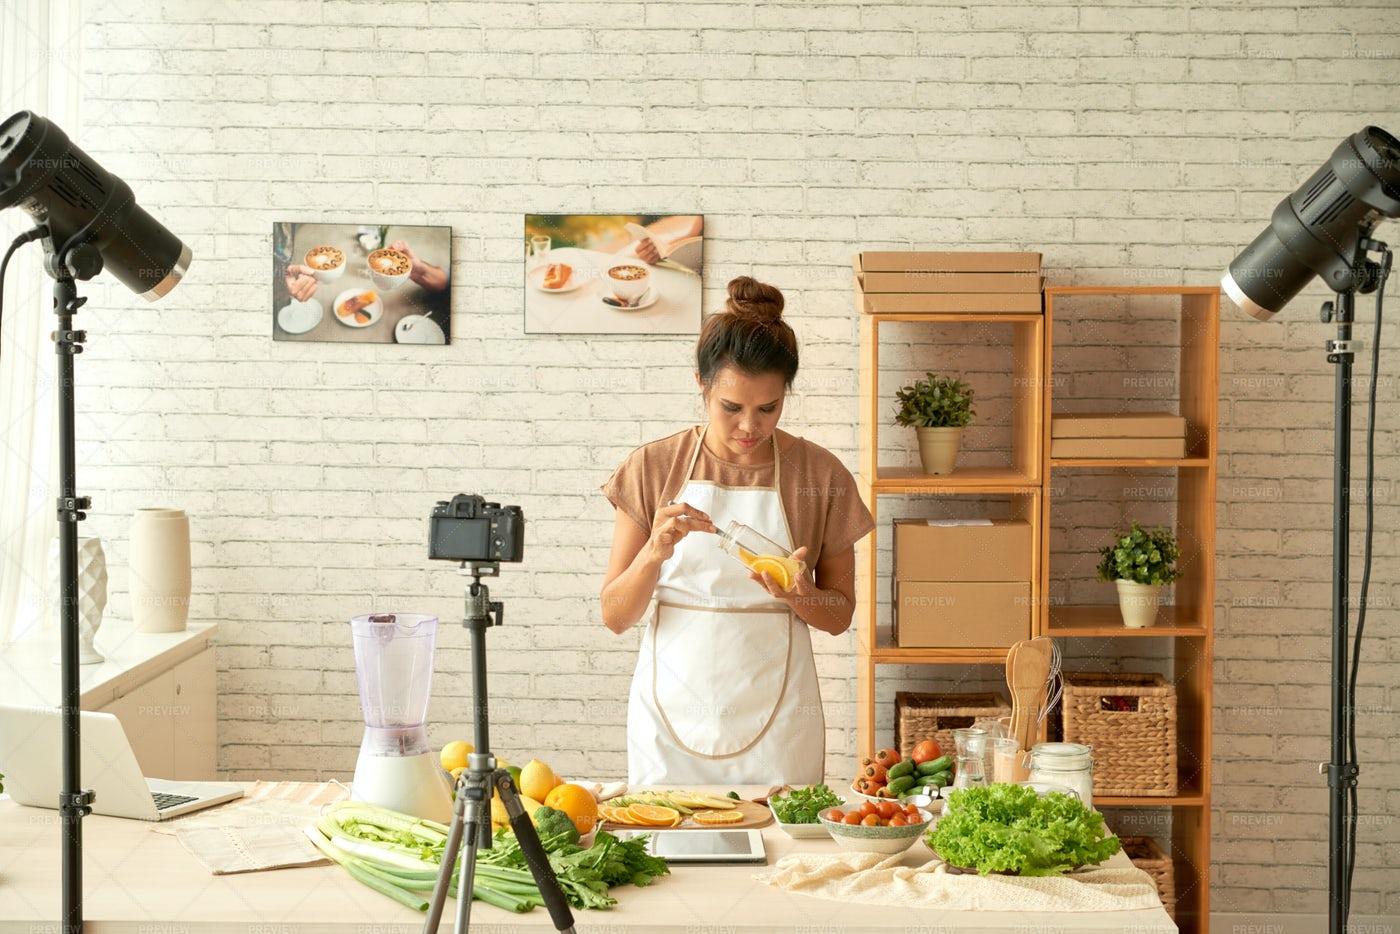 Food Blogger Cooking: Stock Photos